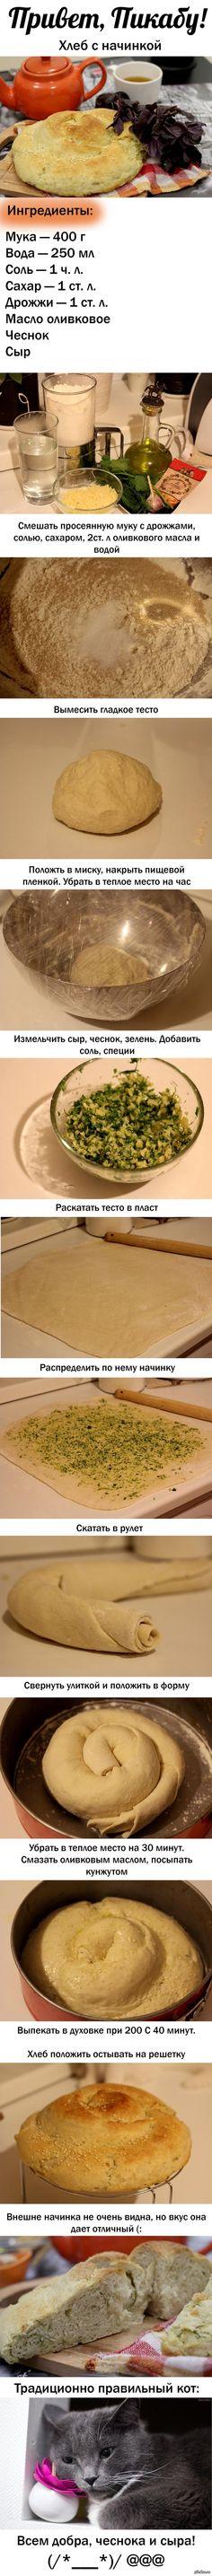 Хлеб с начинкой Нужна духовка!  кулинария, еда, длиннопост, рецепт